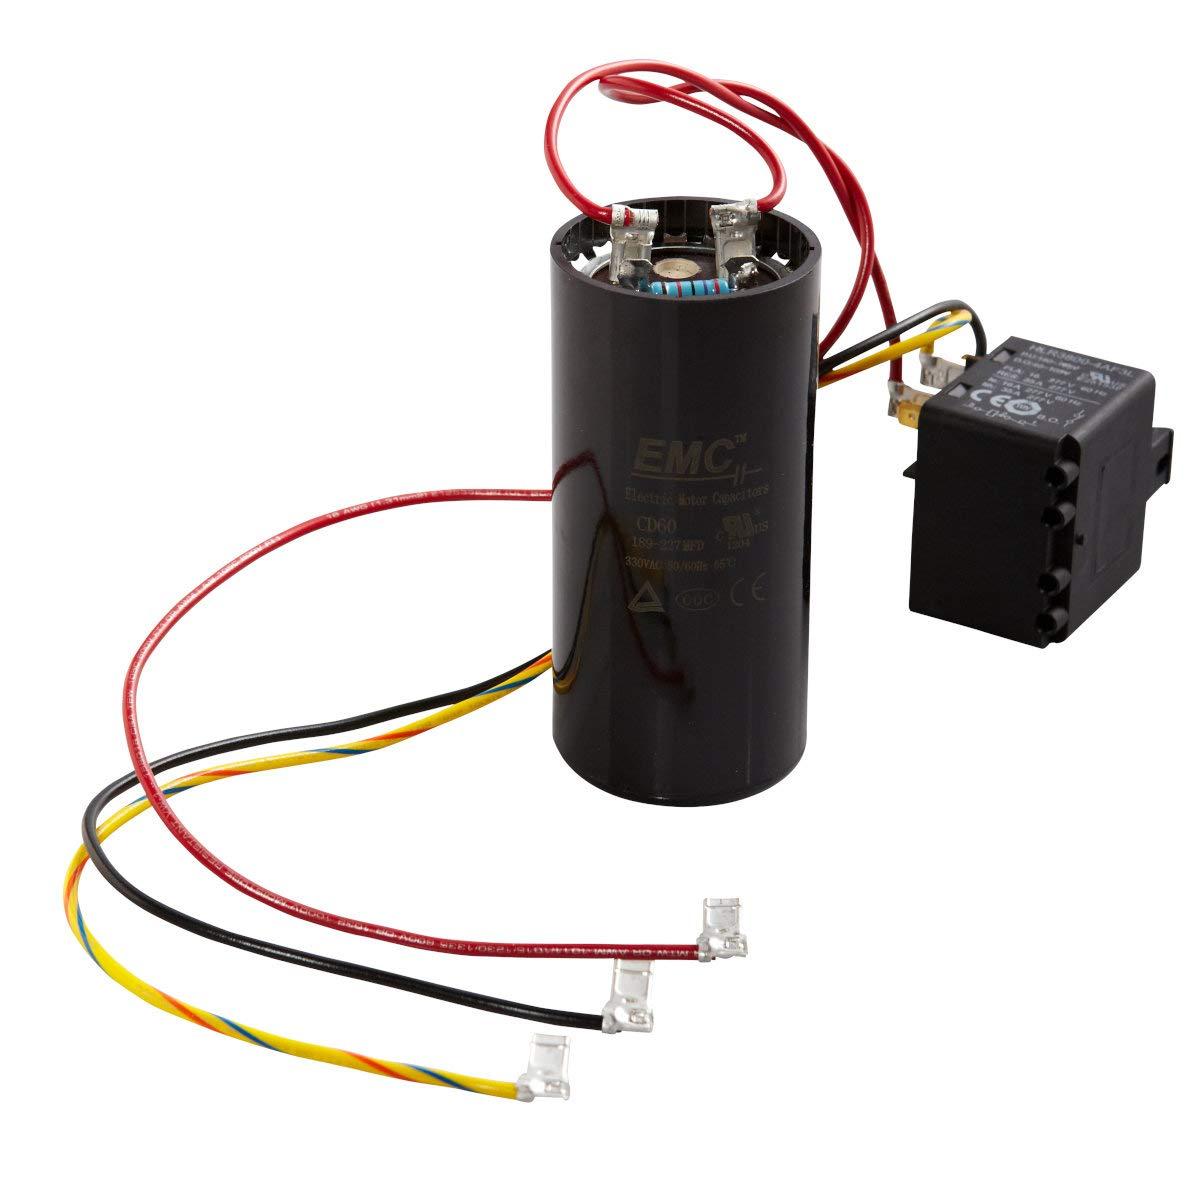 5-2-1 CSRU2 Compressor Saver for 3-1/2 to 5 Ton Units